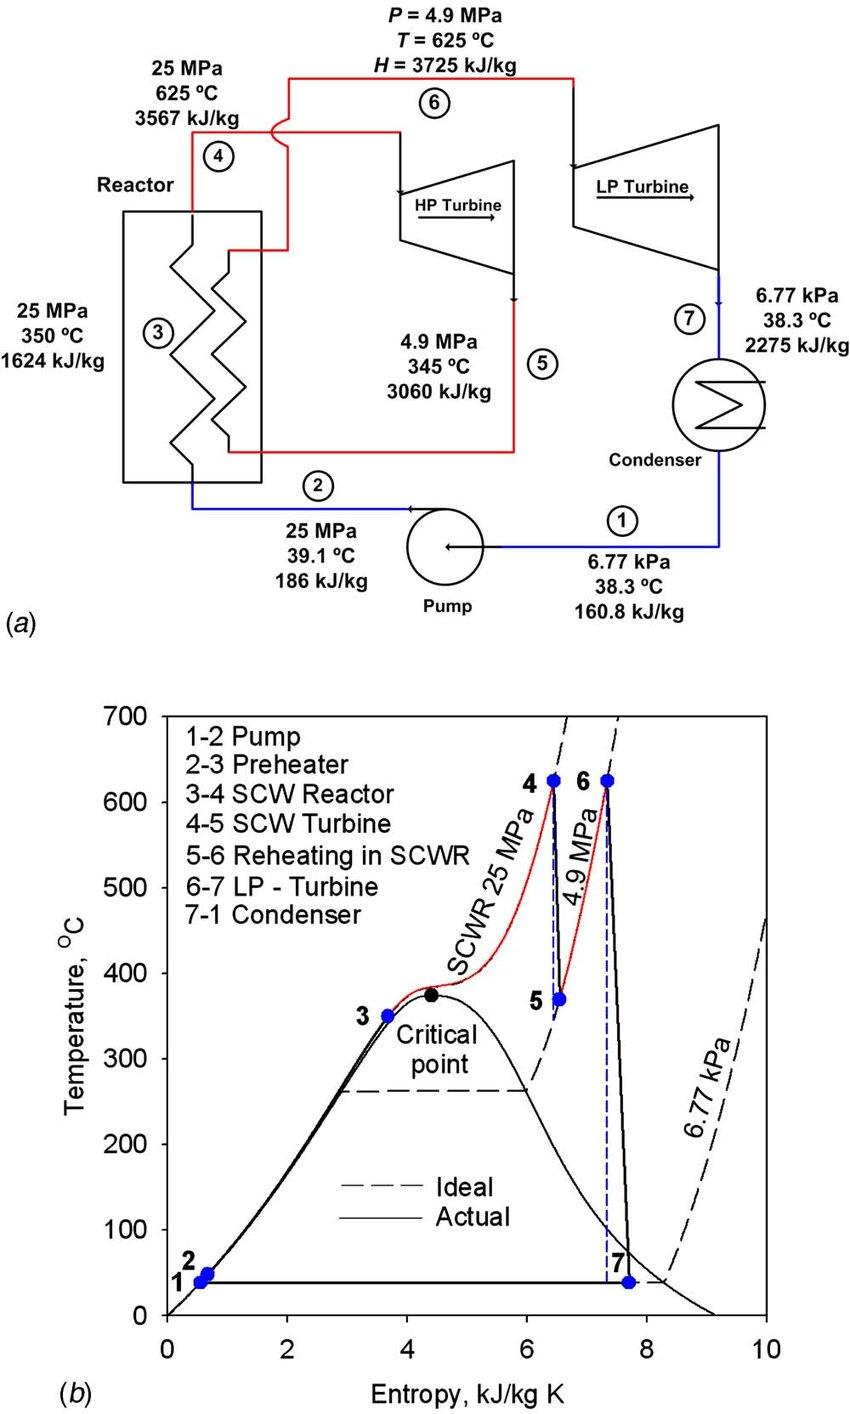 Single-reheat cycle layout